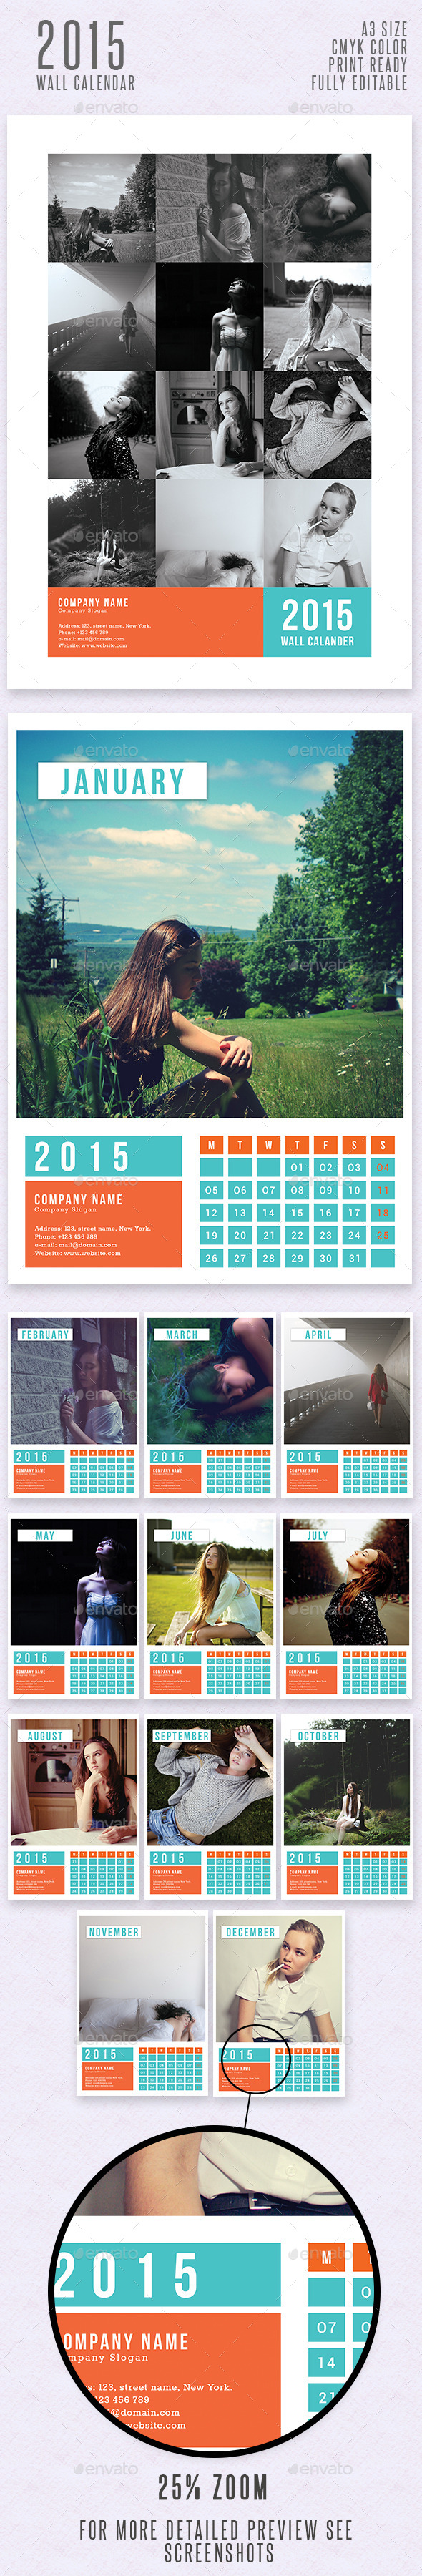 GraphicRiver Simple Wall Calendar 2015 9701789